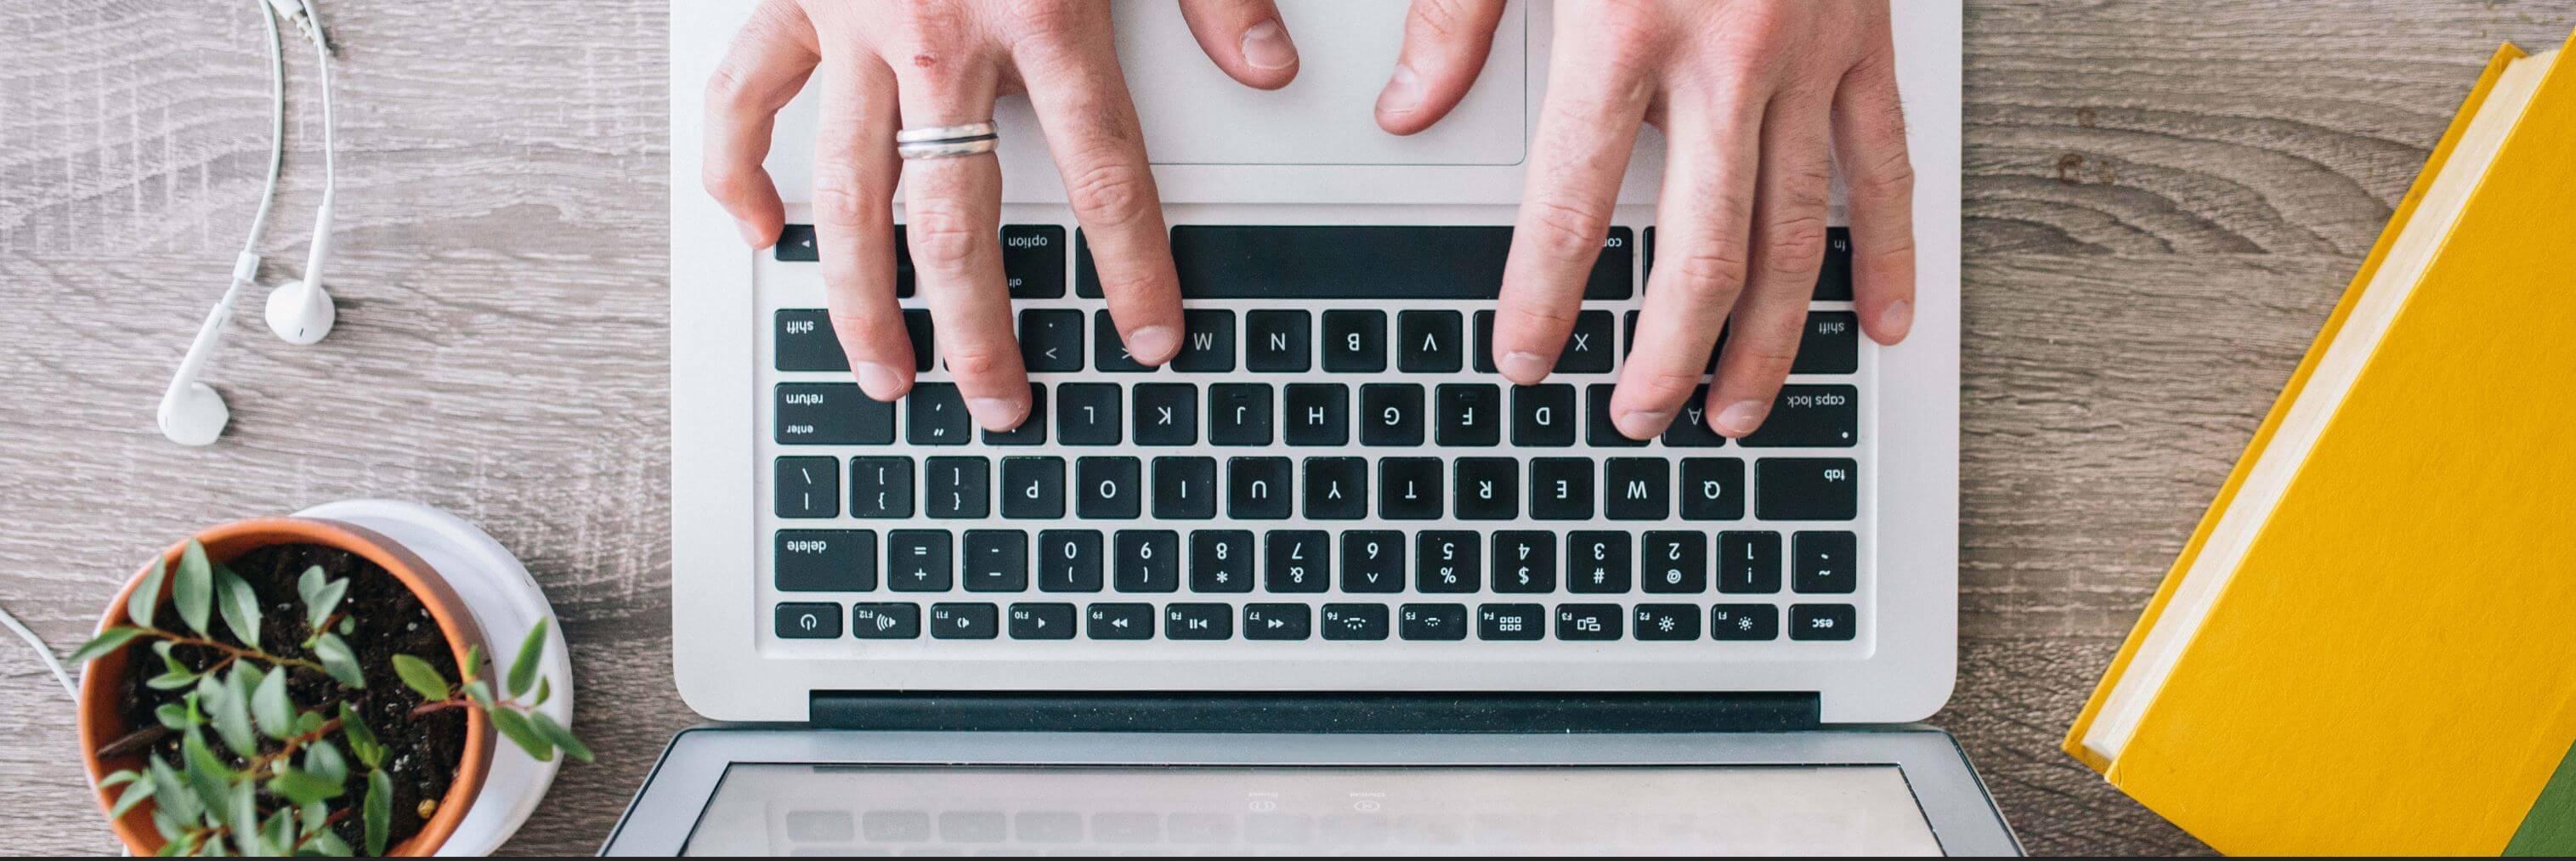 SaaS Marketing hero image of laptop keyboard 1200 x 400.jpg